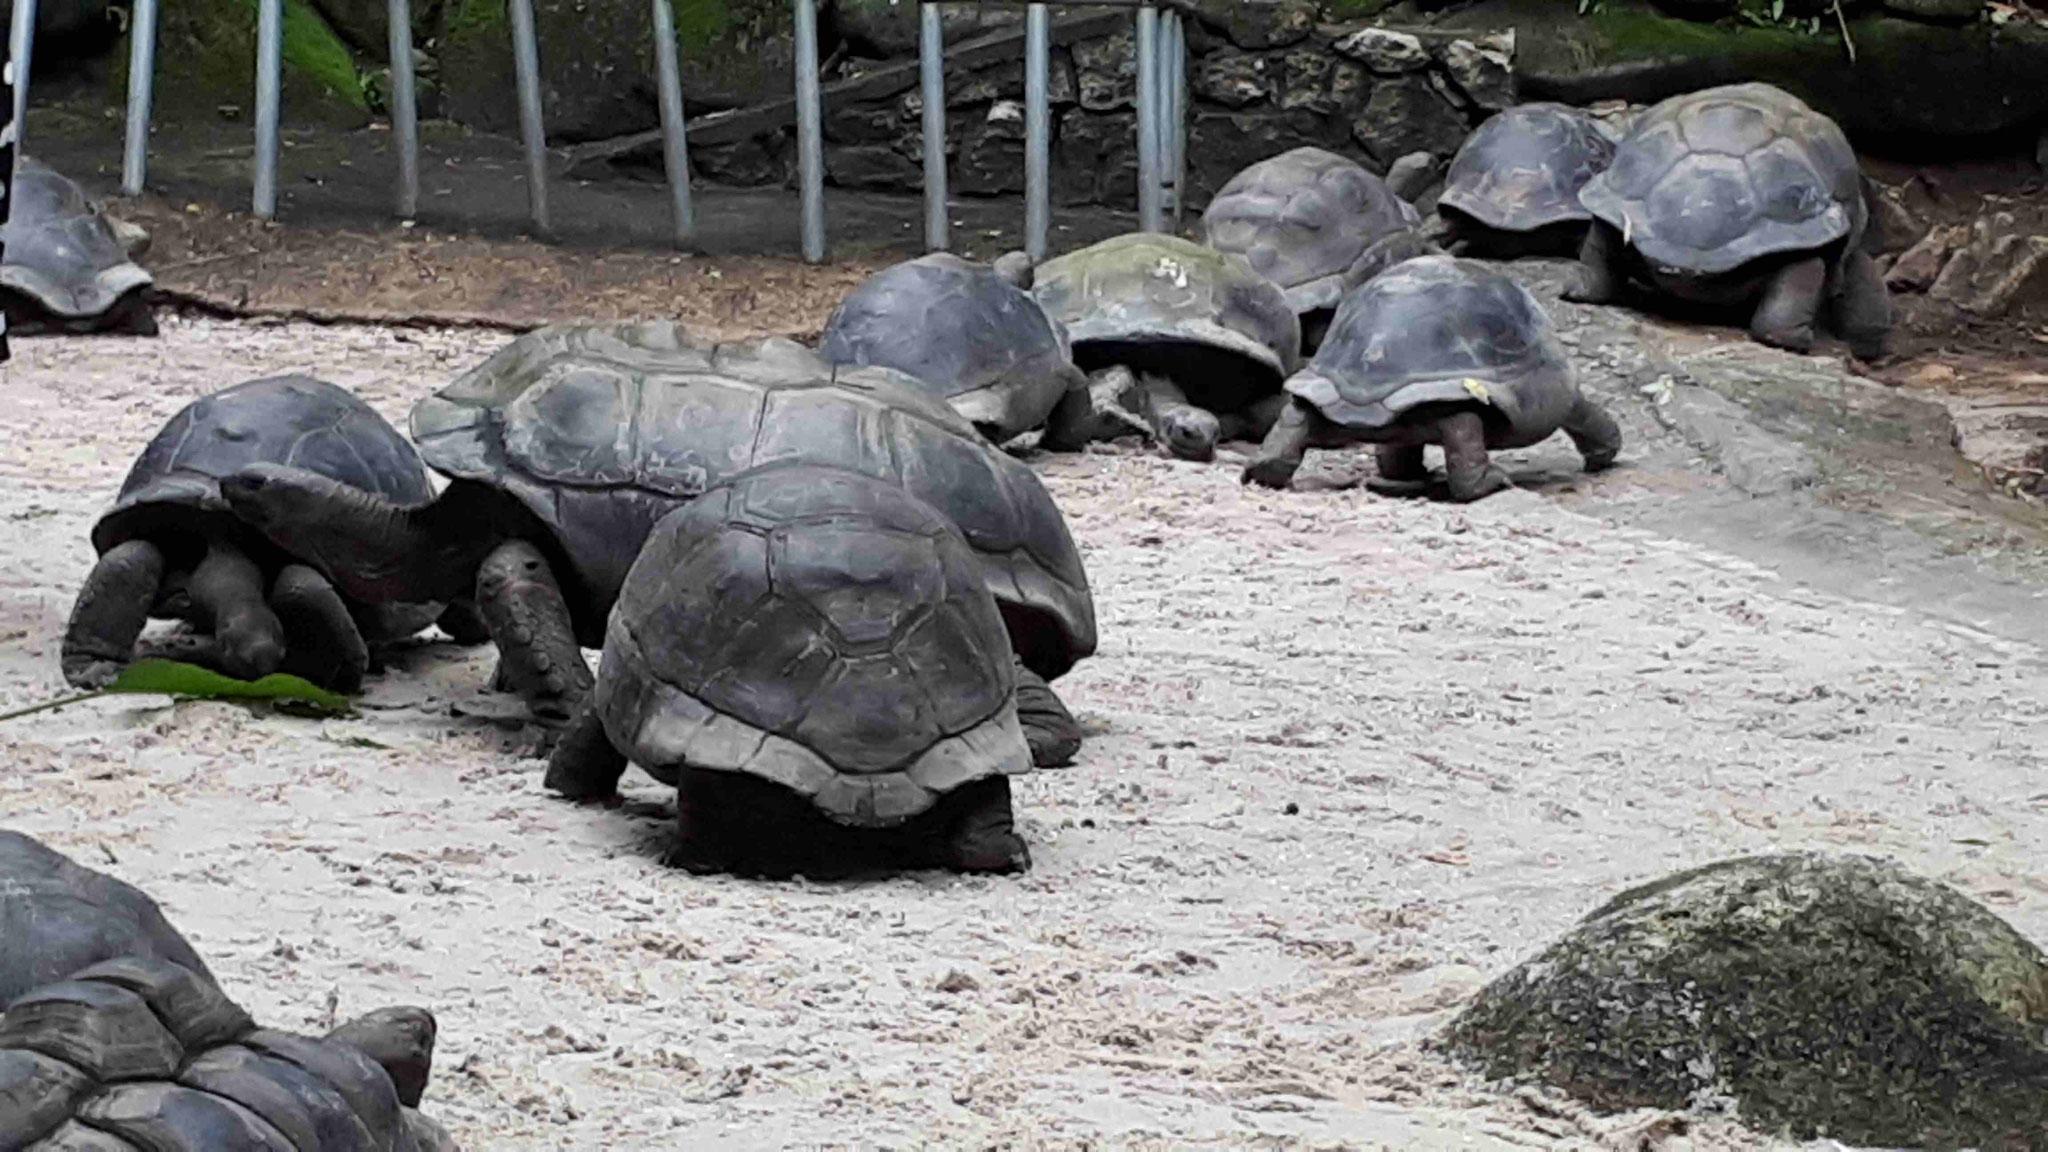 Botanischer Garten -Schildkröten